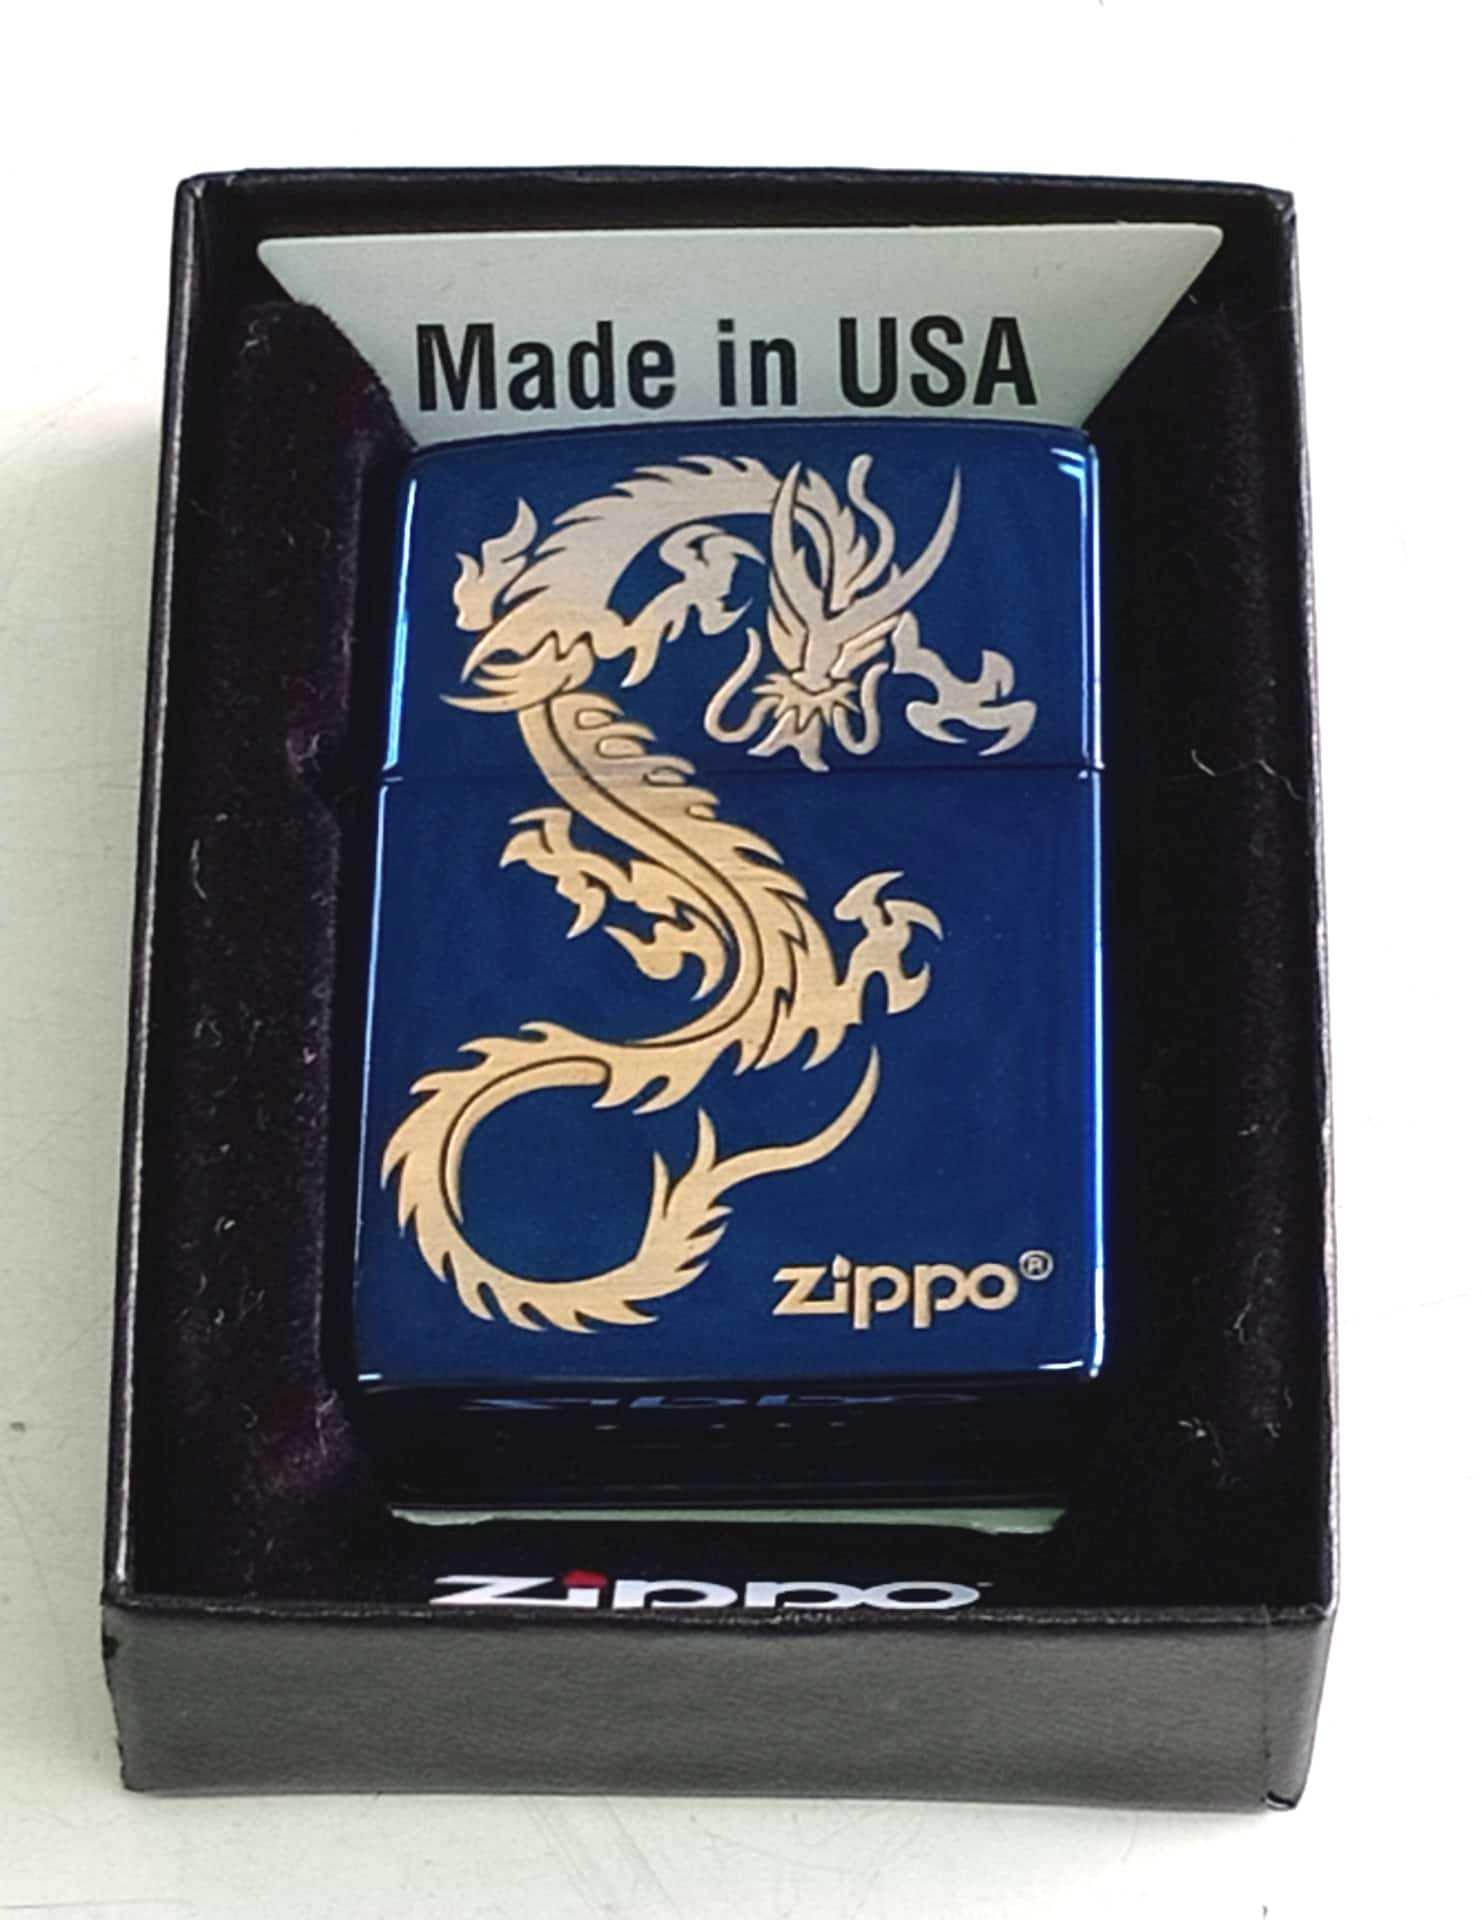 Zippo xanh saphia khac laze hinh rong logo Z768